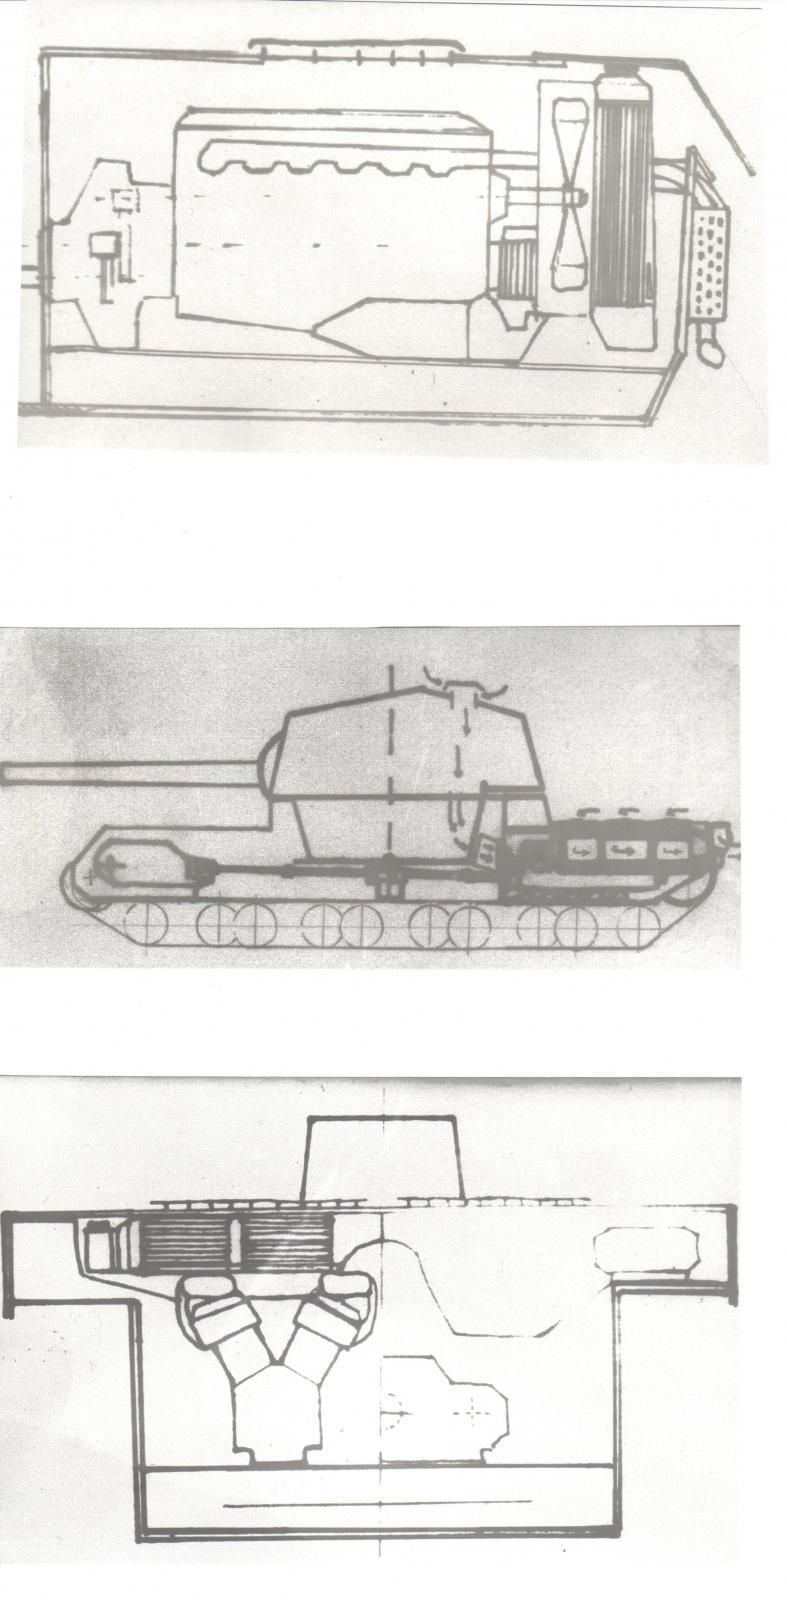 Grigoriev's drawings of the Type 2605